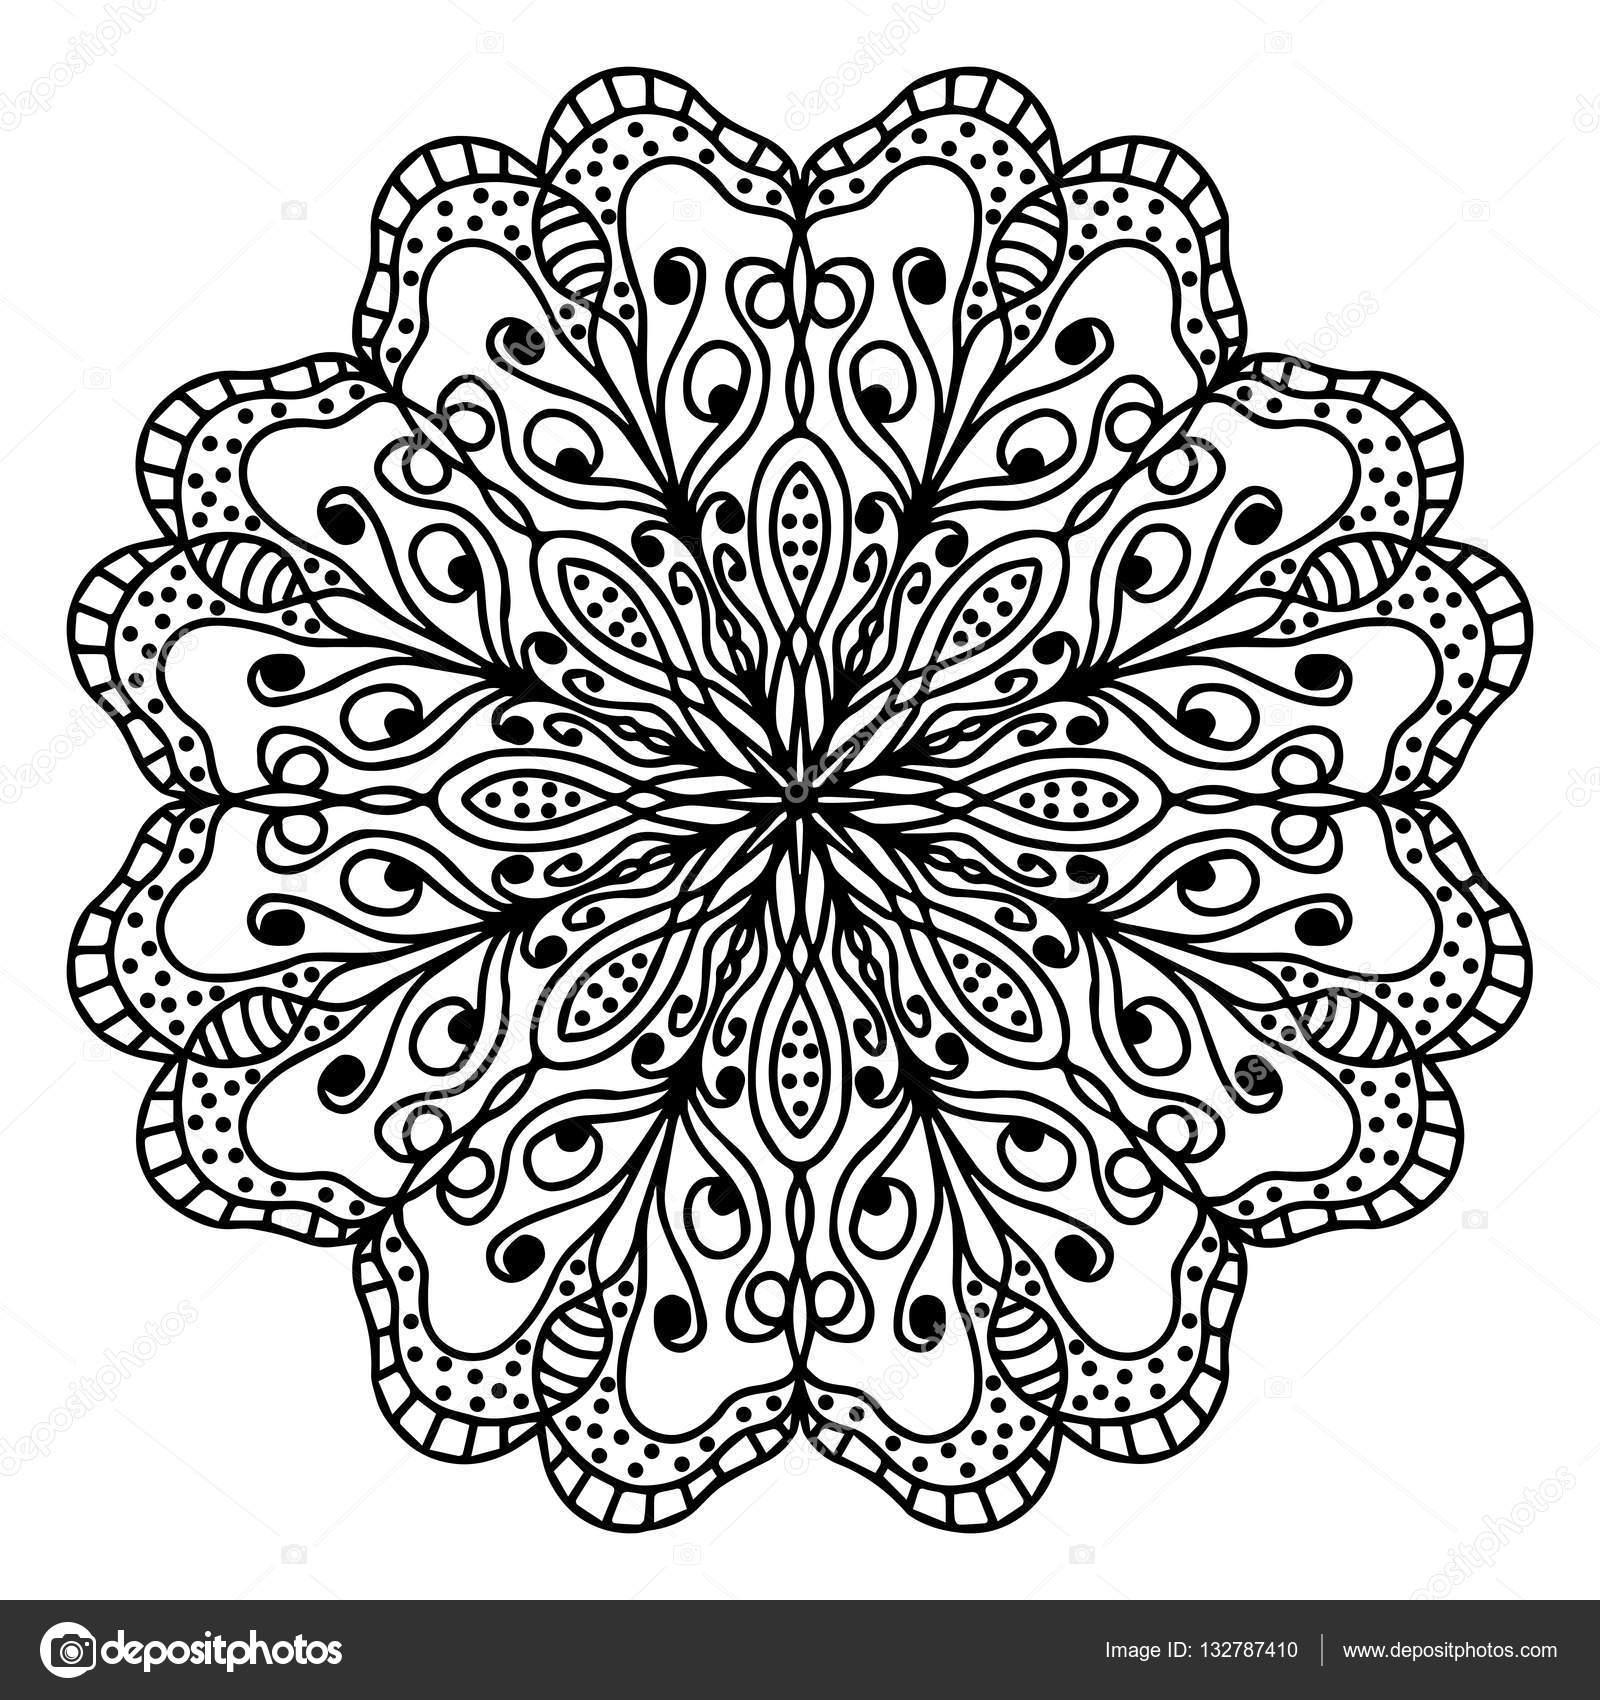 mandala kleurplaat pagina doodle stockvector 169 origaz